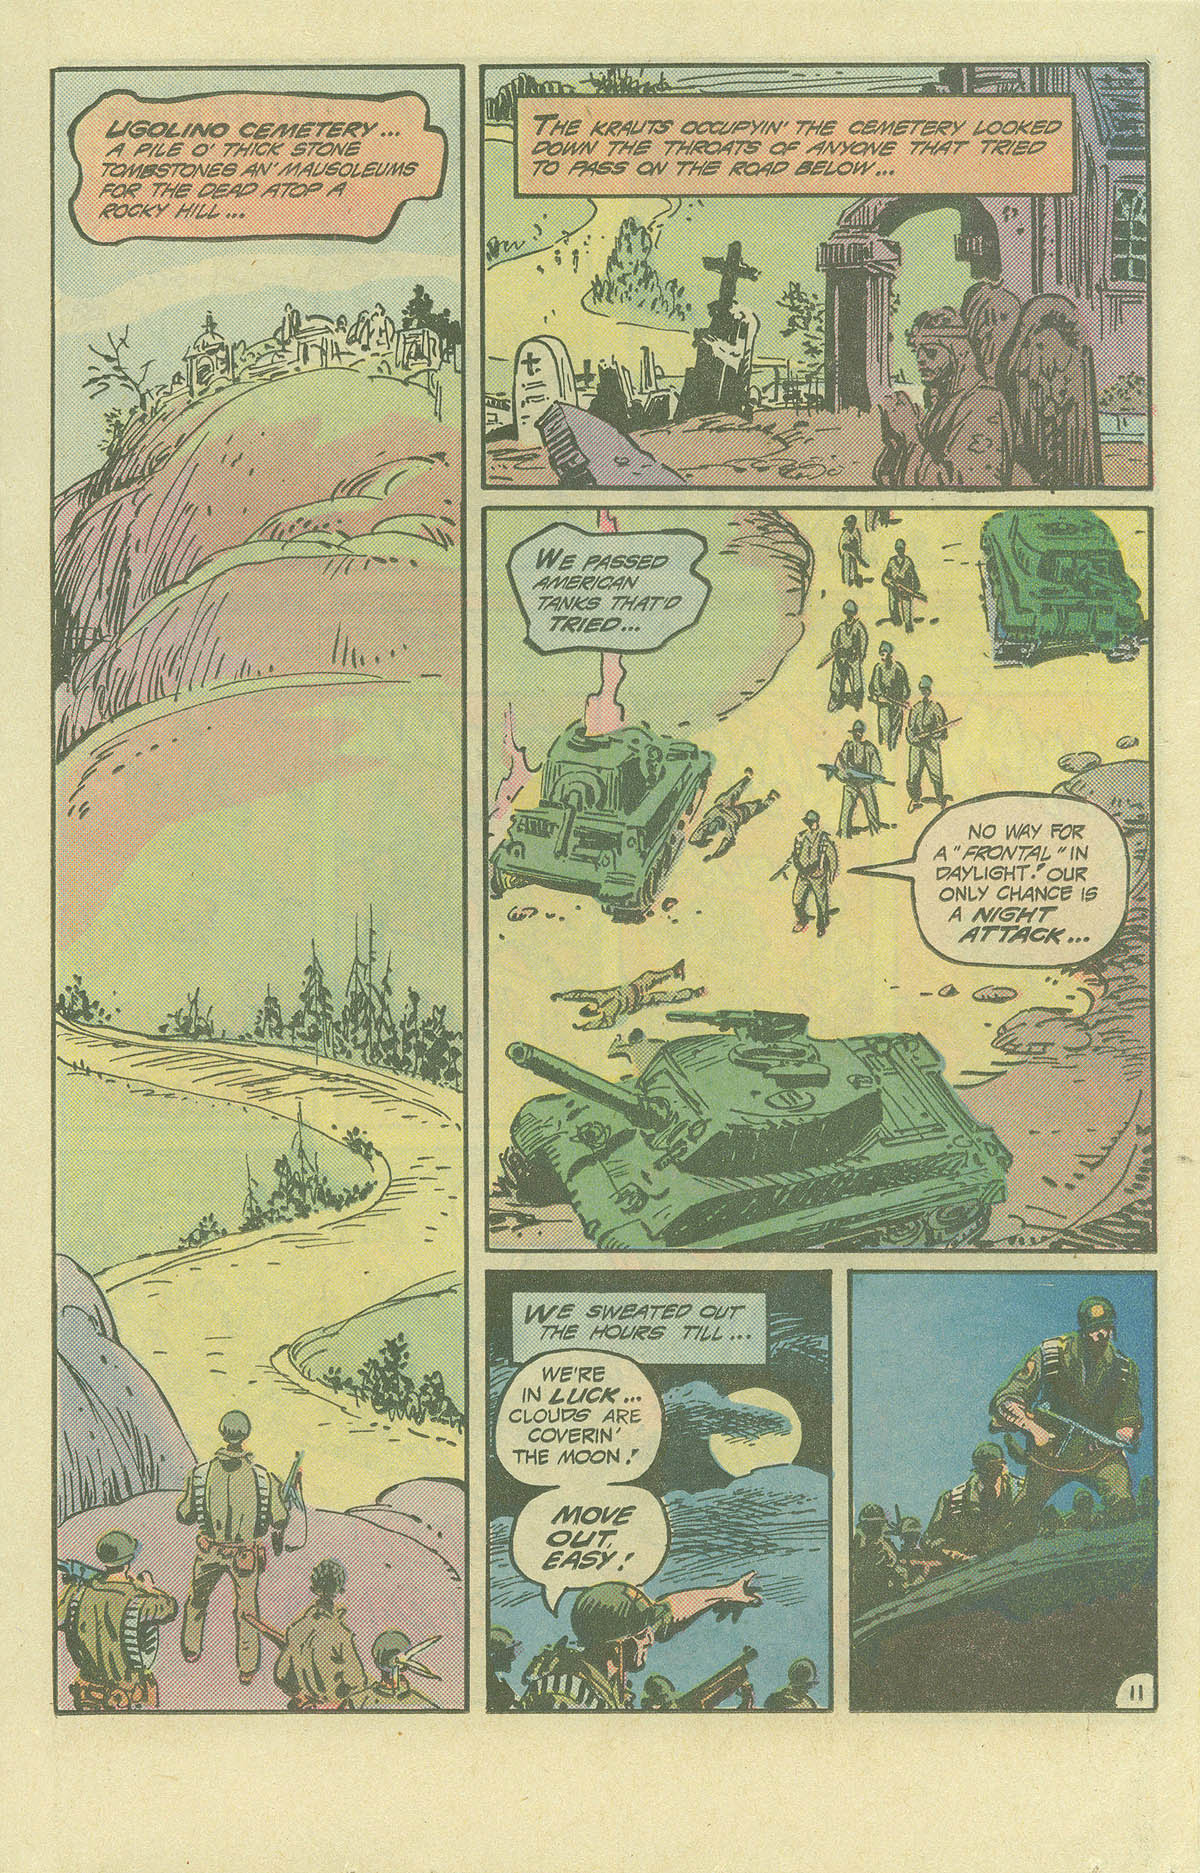 Read online Sgt. Rock comic -  Issue #393 - 11